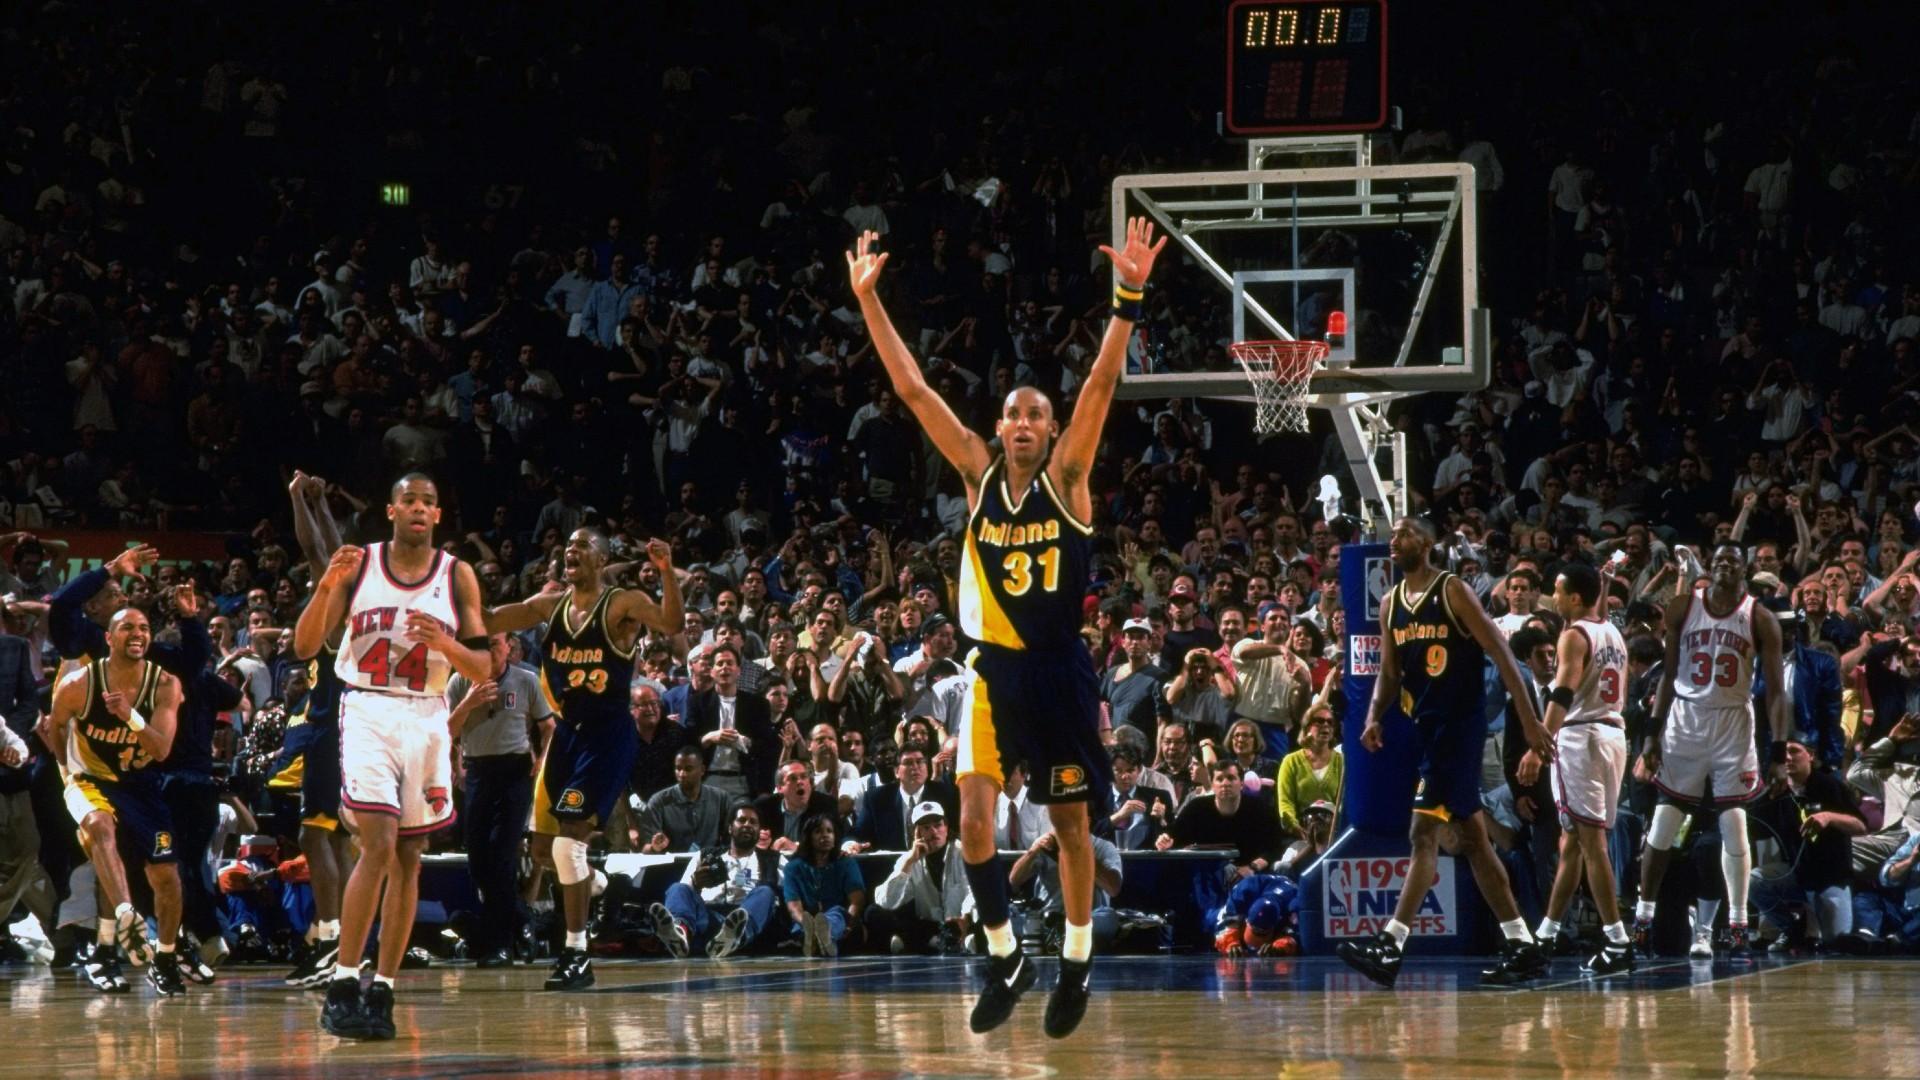 NBA season preview: the 50 best scenarios to watch in 2021-2022 (part 1)